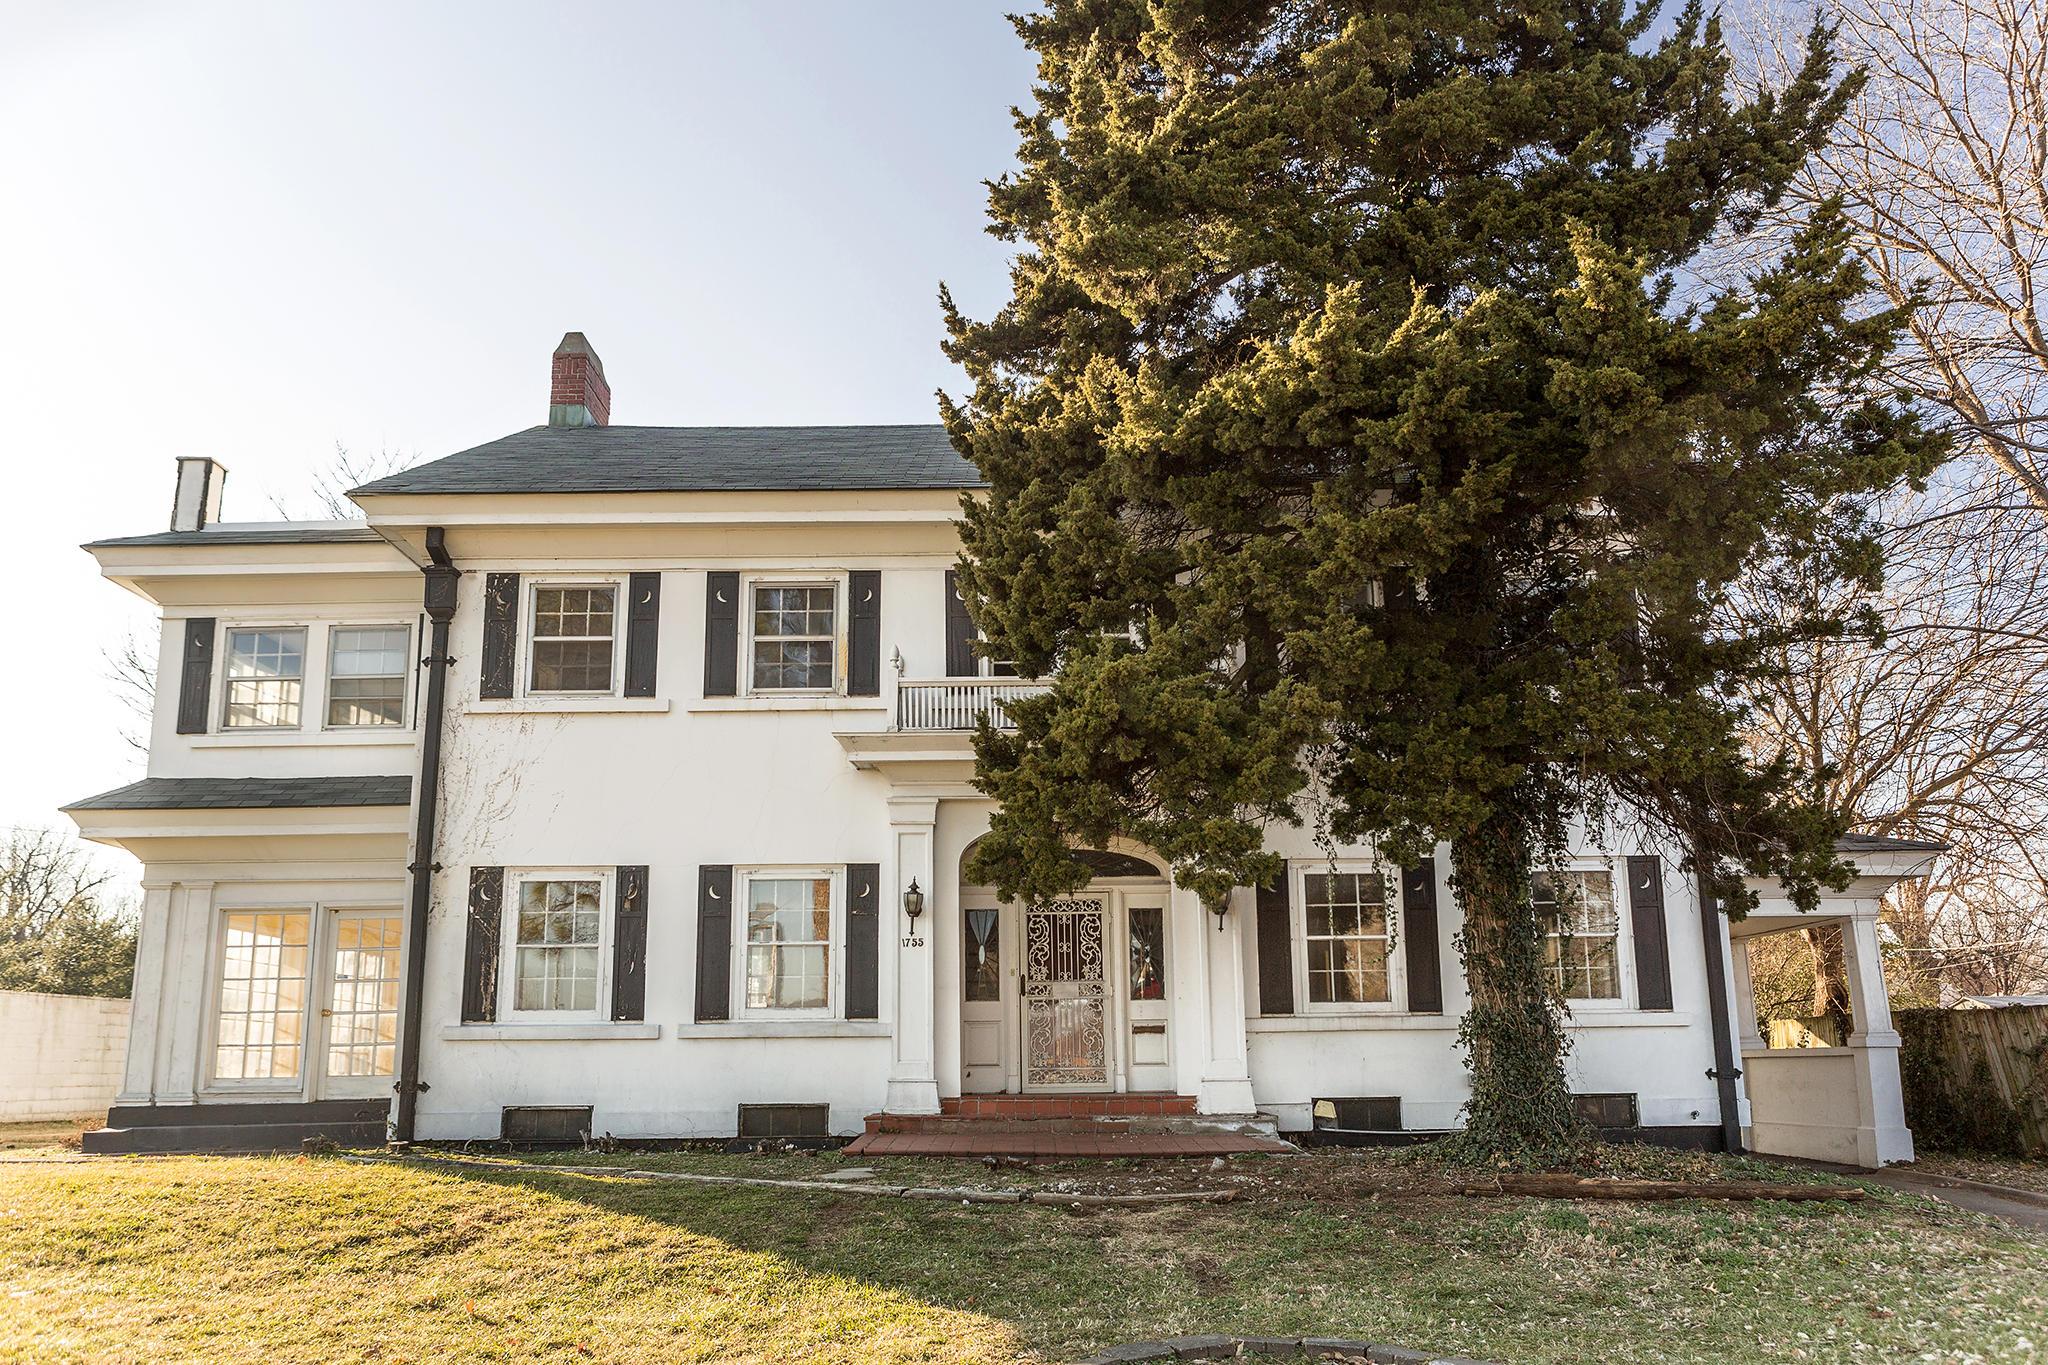 1755 South National Avenue Springfield, MO 65804